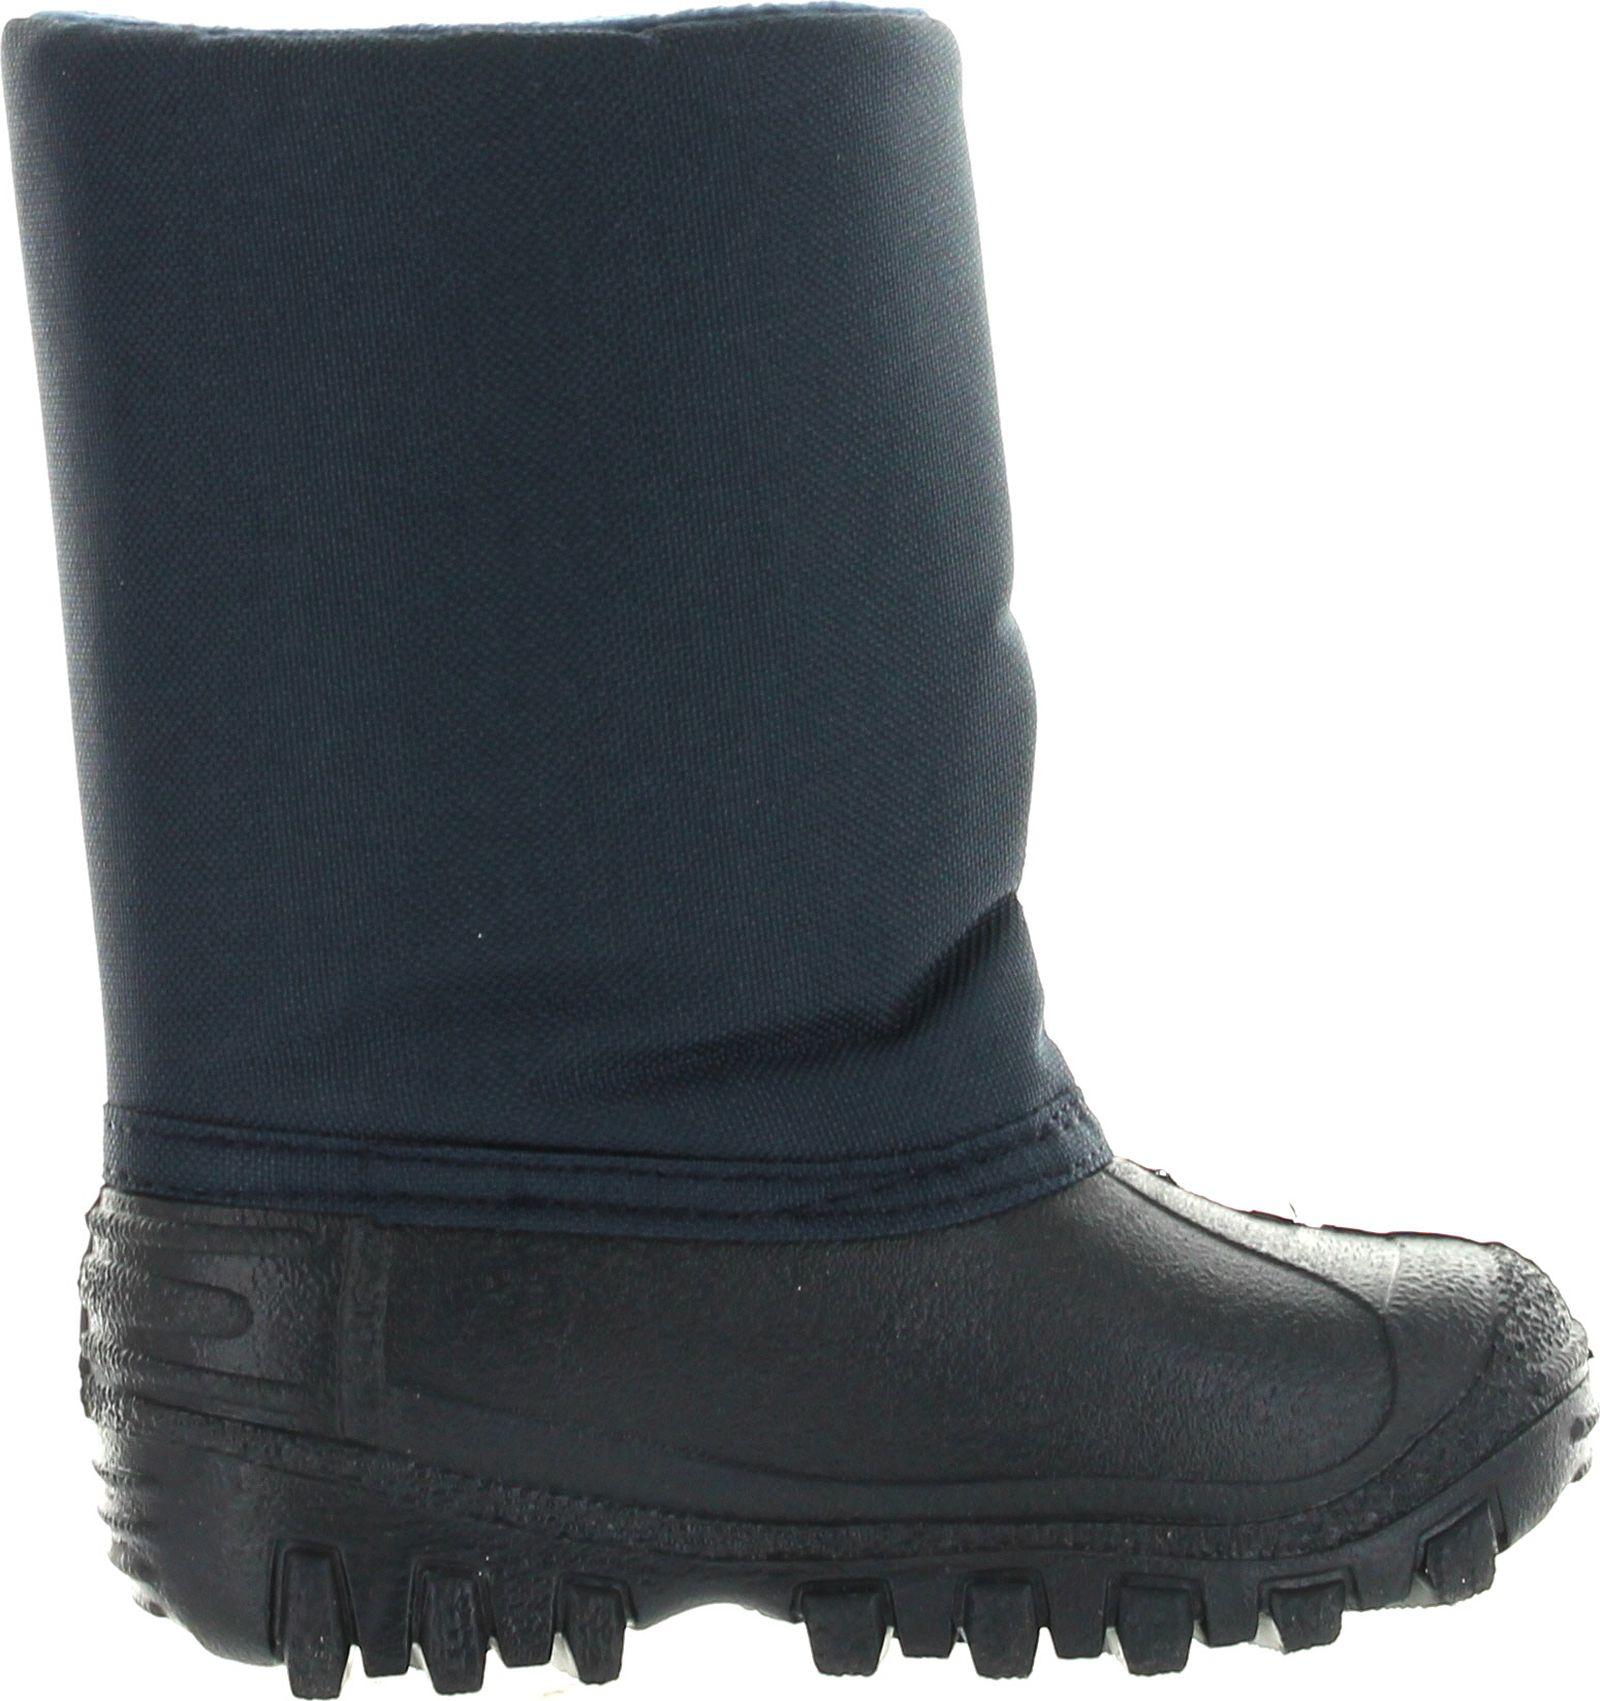 tundra teddy 4 waterproof winter snow boot ebay